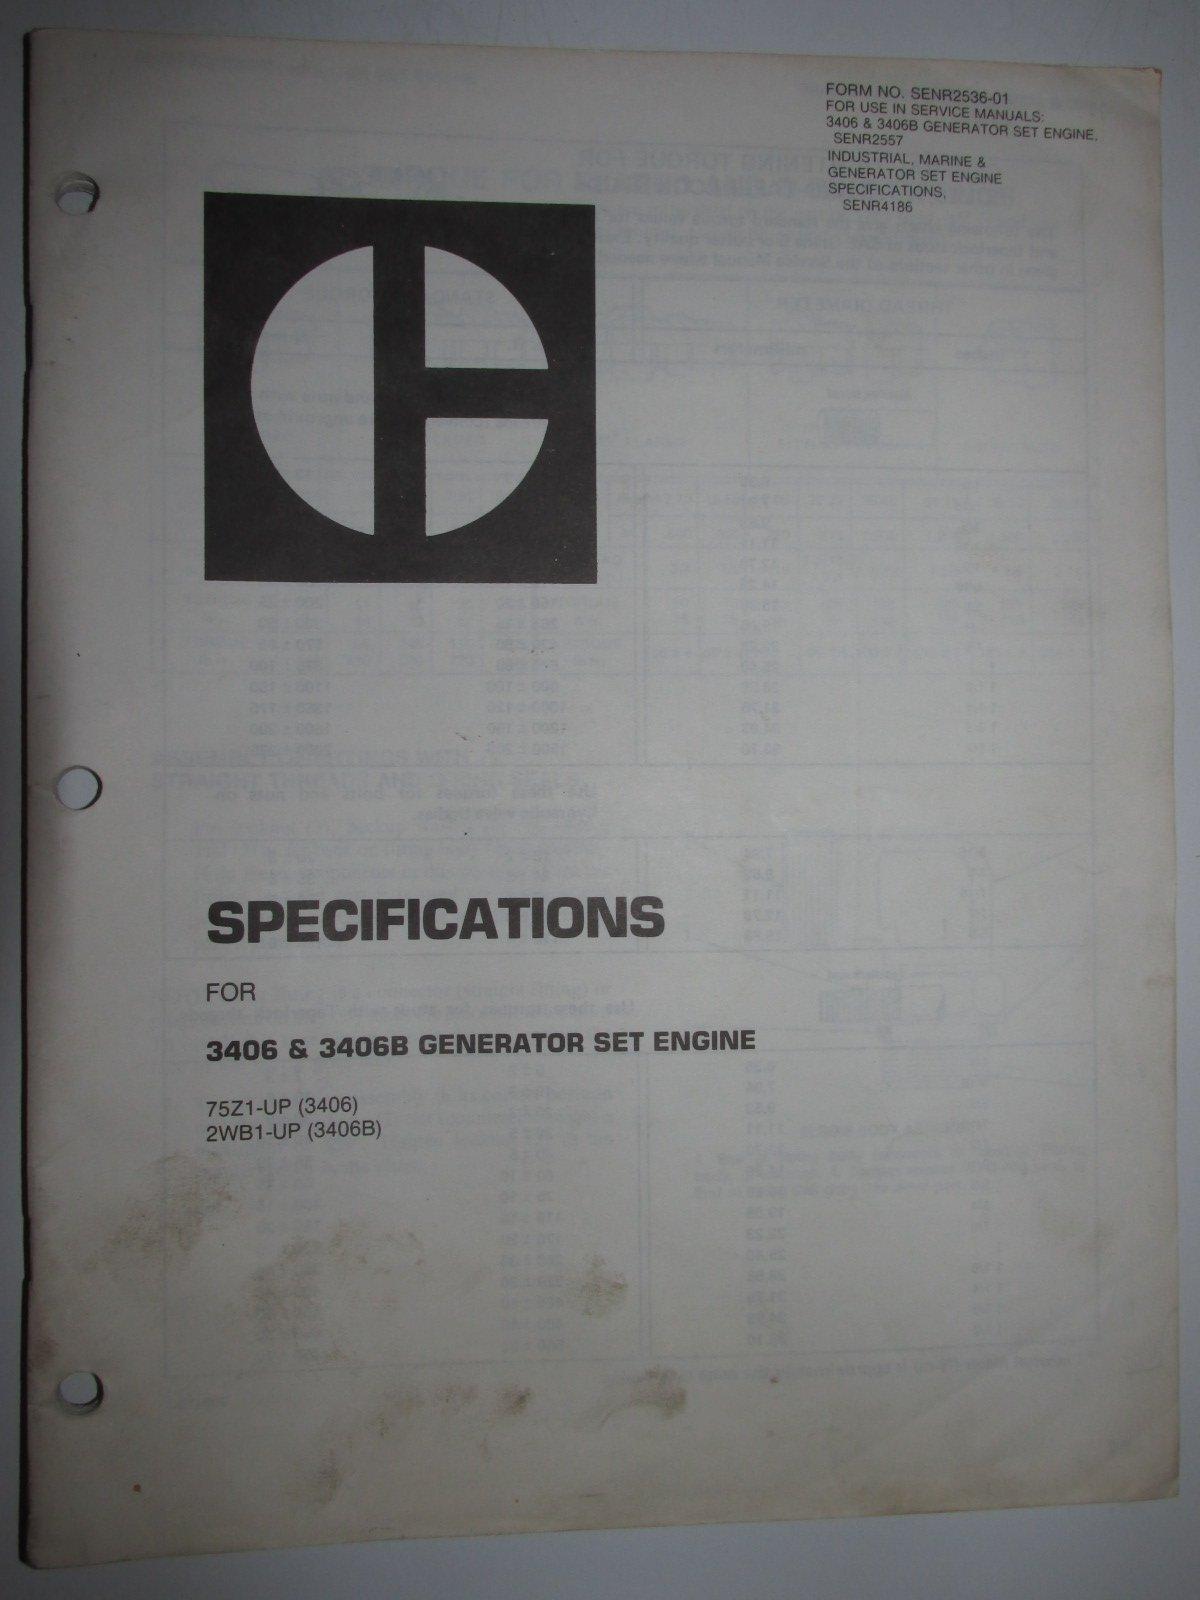 Caterpillar 3406 & 3406B Generator Set Engine Specifications Manual  SENR2536-01: Caterpillar: Amazon.com: Books